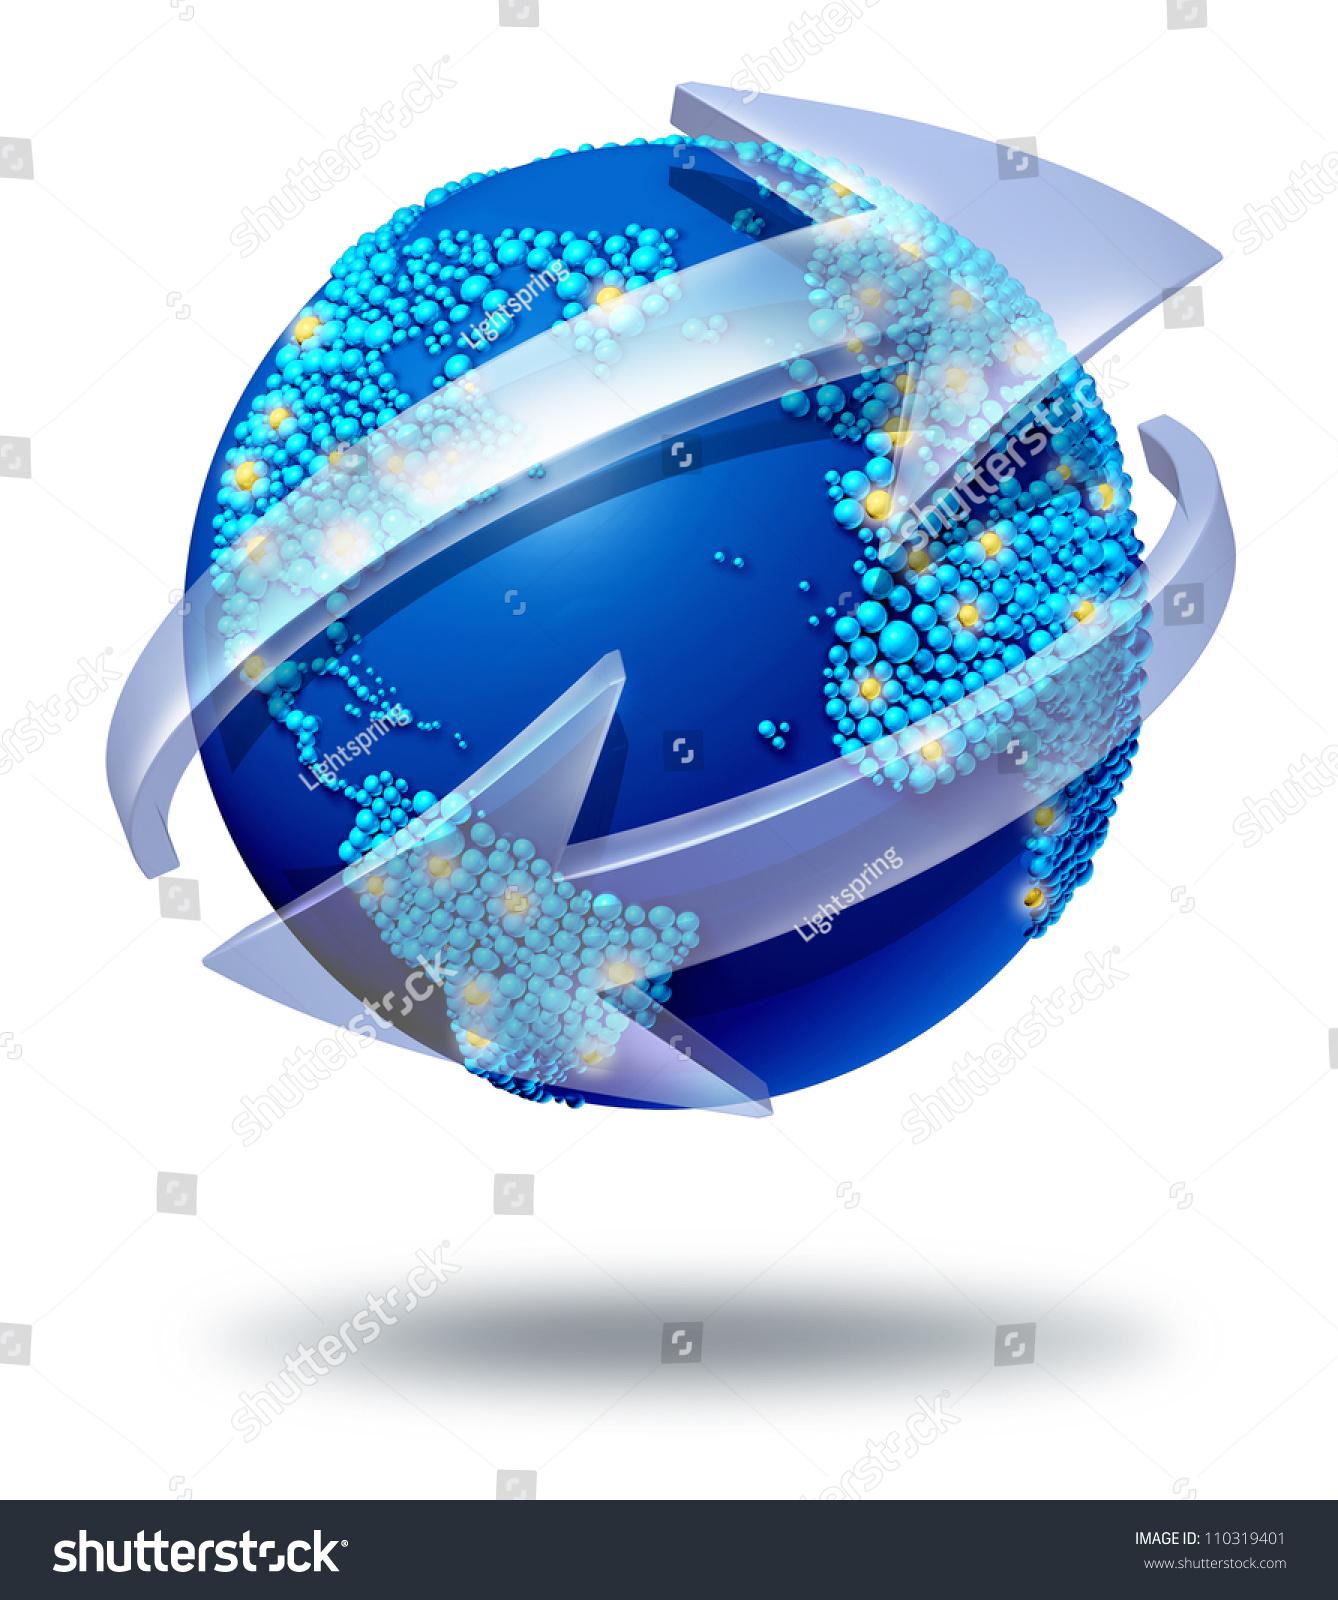 global communications in the global society 1 communicating effectively under risk: on the need for a communication contract for the global society birgitta dresp-langley icube umr 7357 cnrs-université de strasbourg.